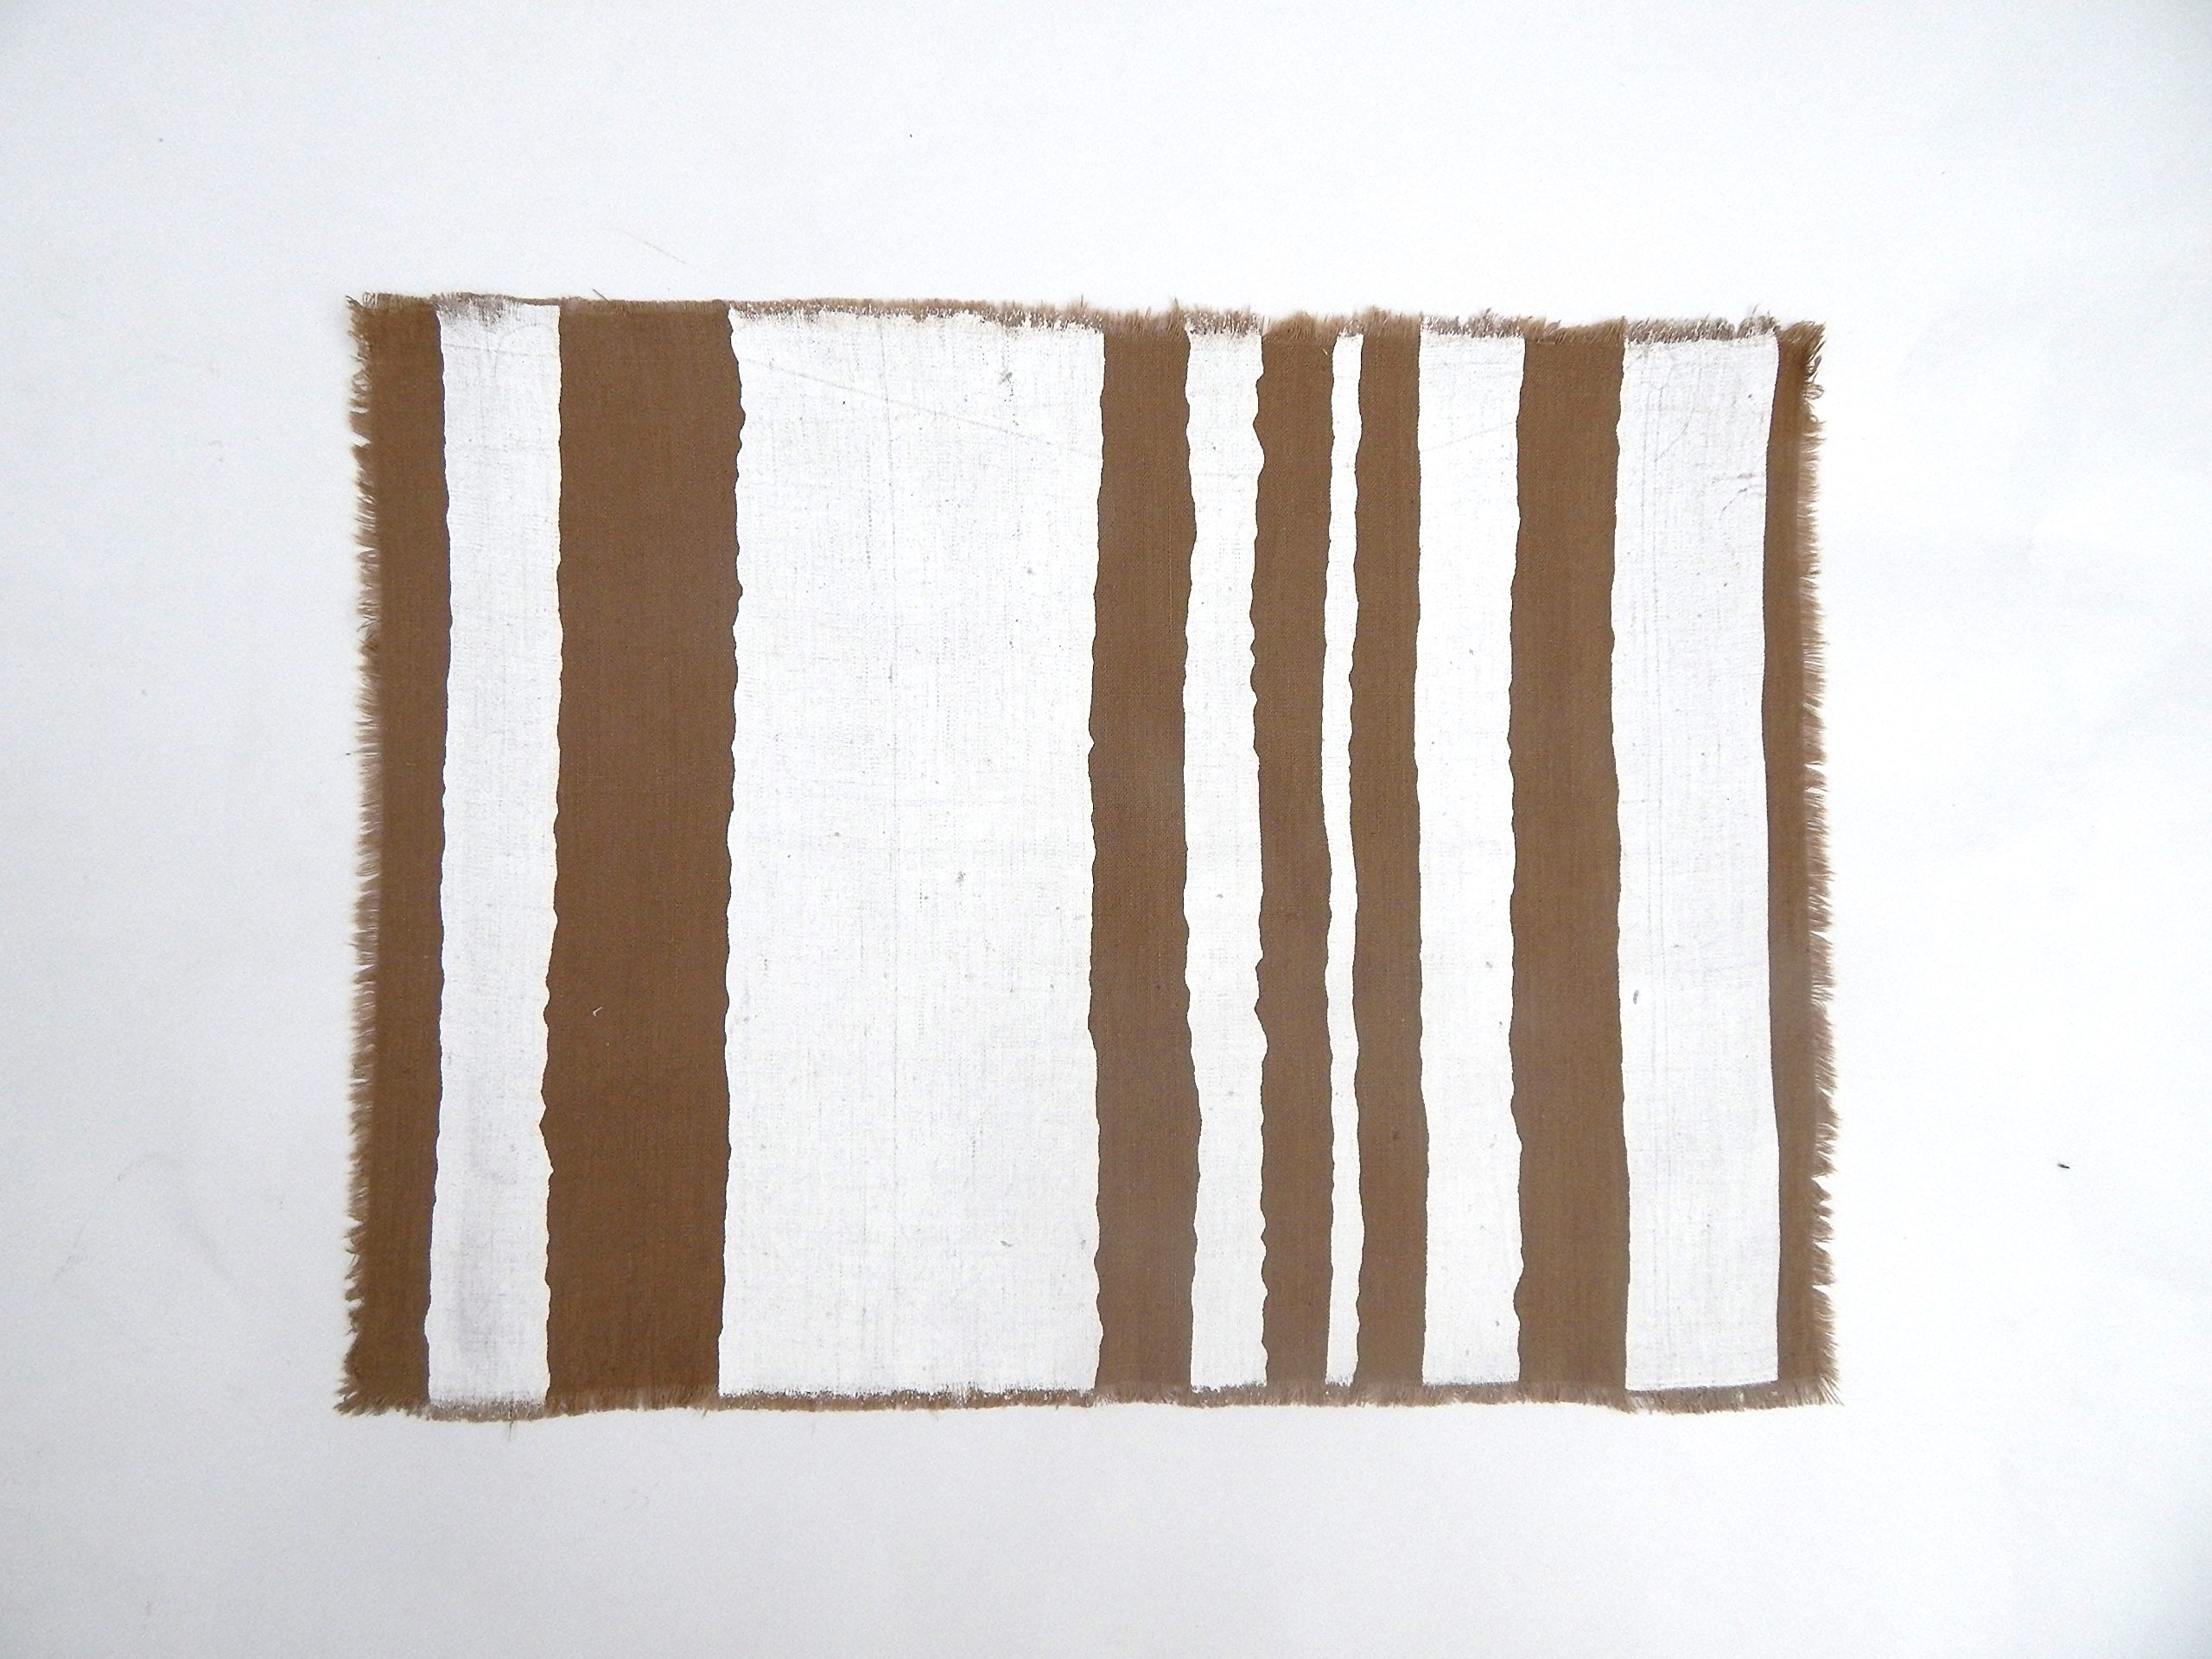 Gitika Goyal Home Windows Collection Cotton Khadi Khaki Mat 17x12 Wave Design, White Hand Screen Print